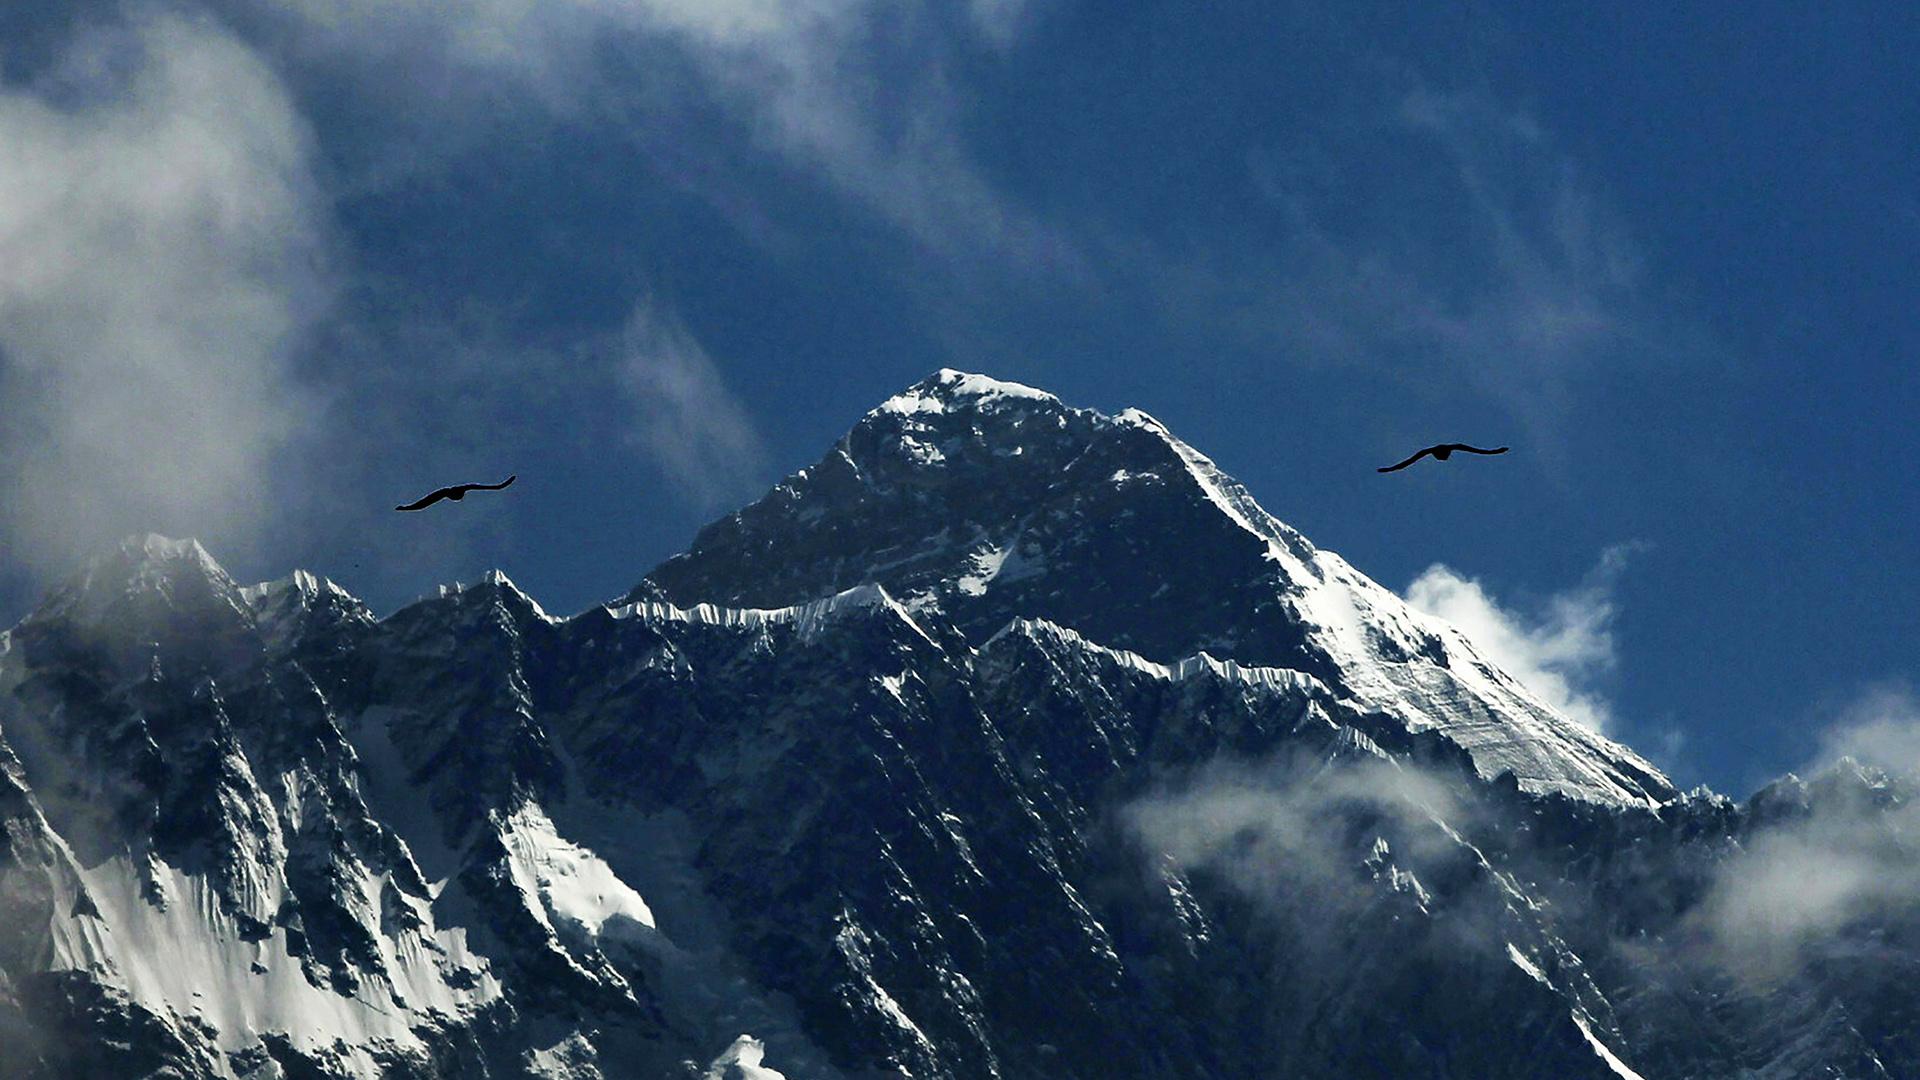 Mira cómo el COVID-19 afectó al Everest